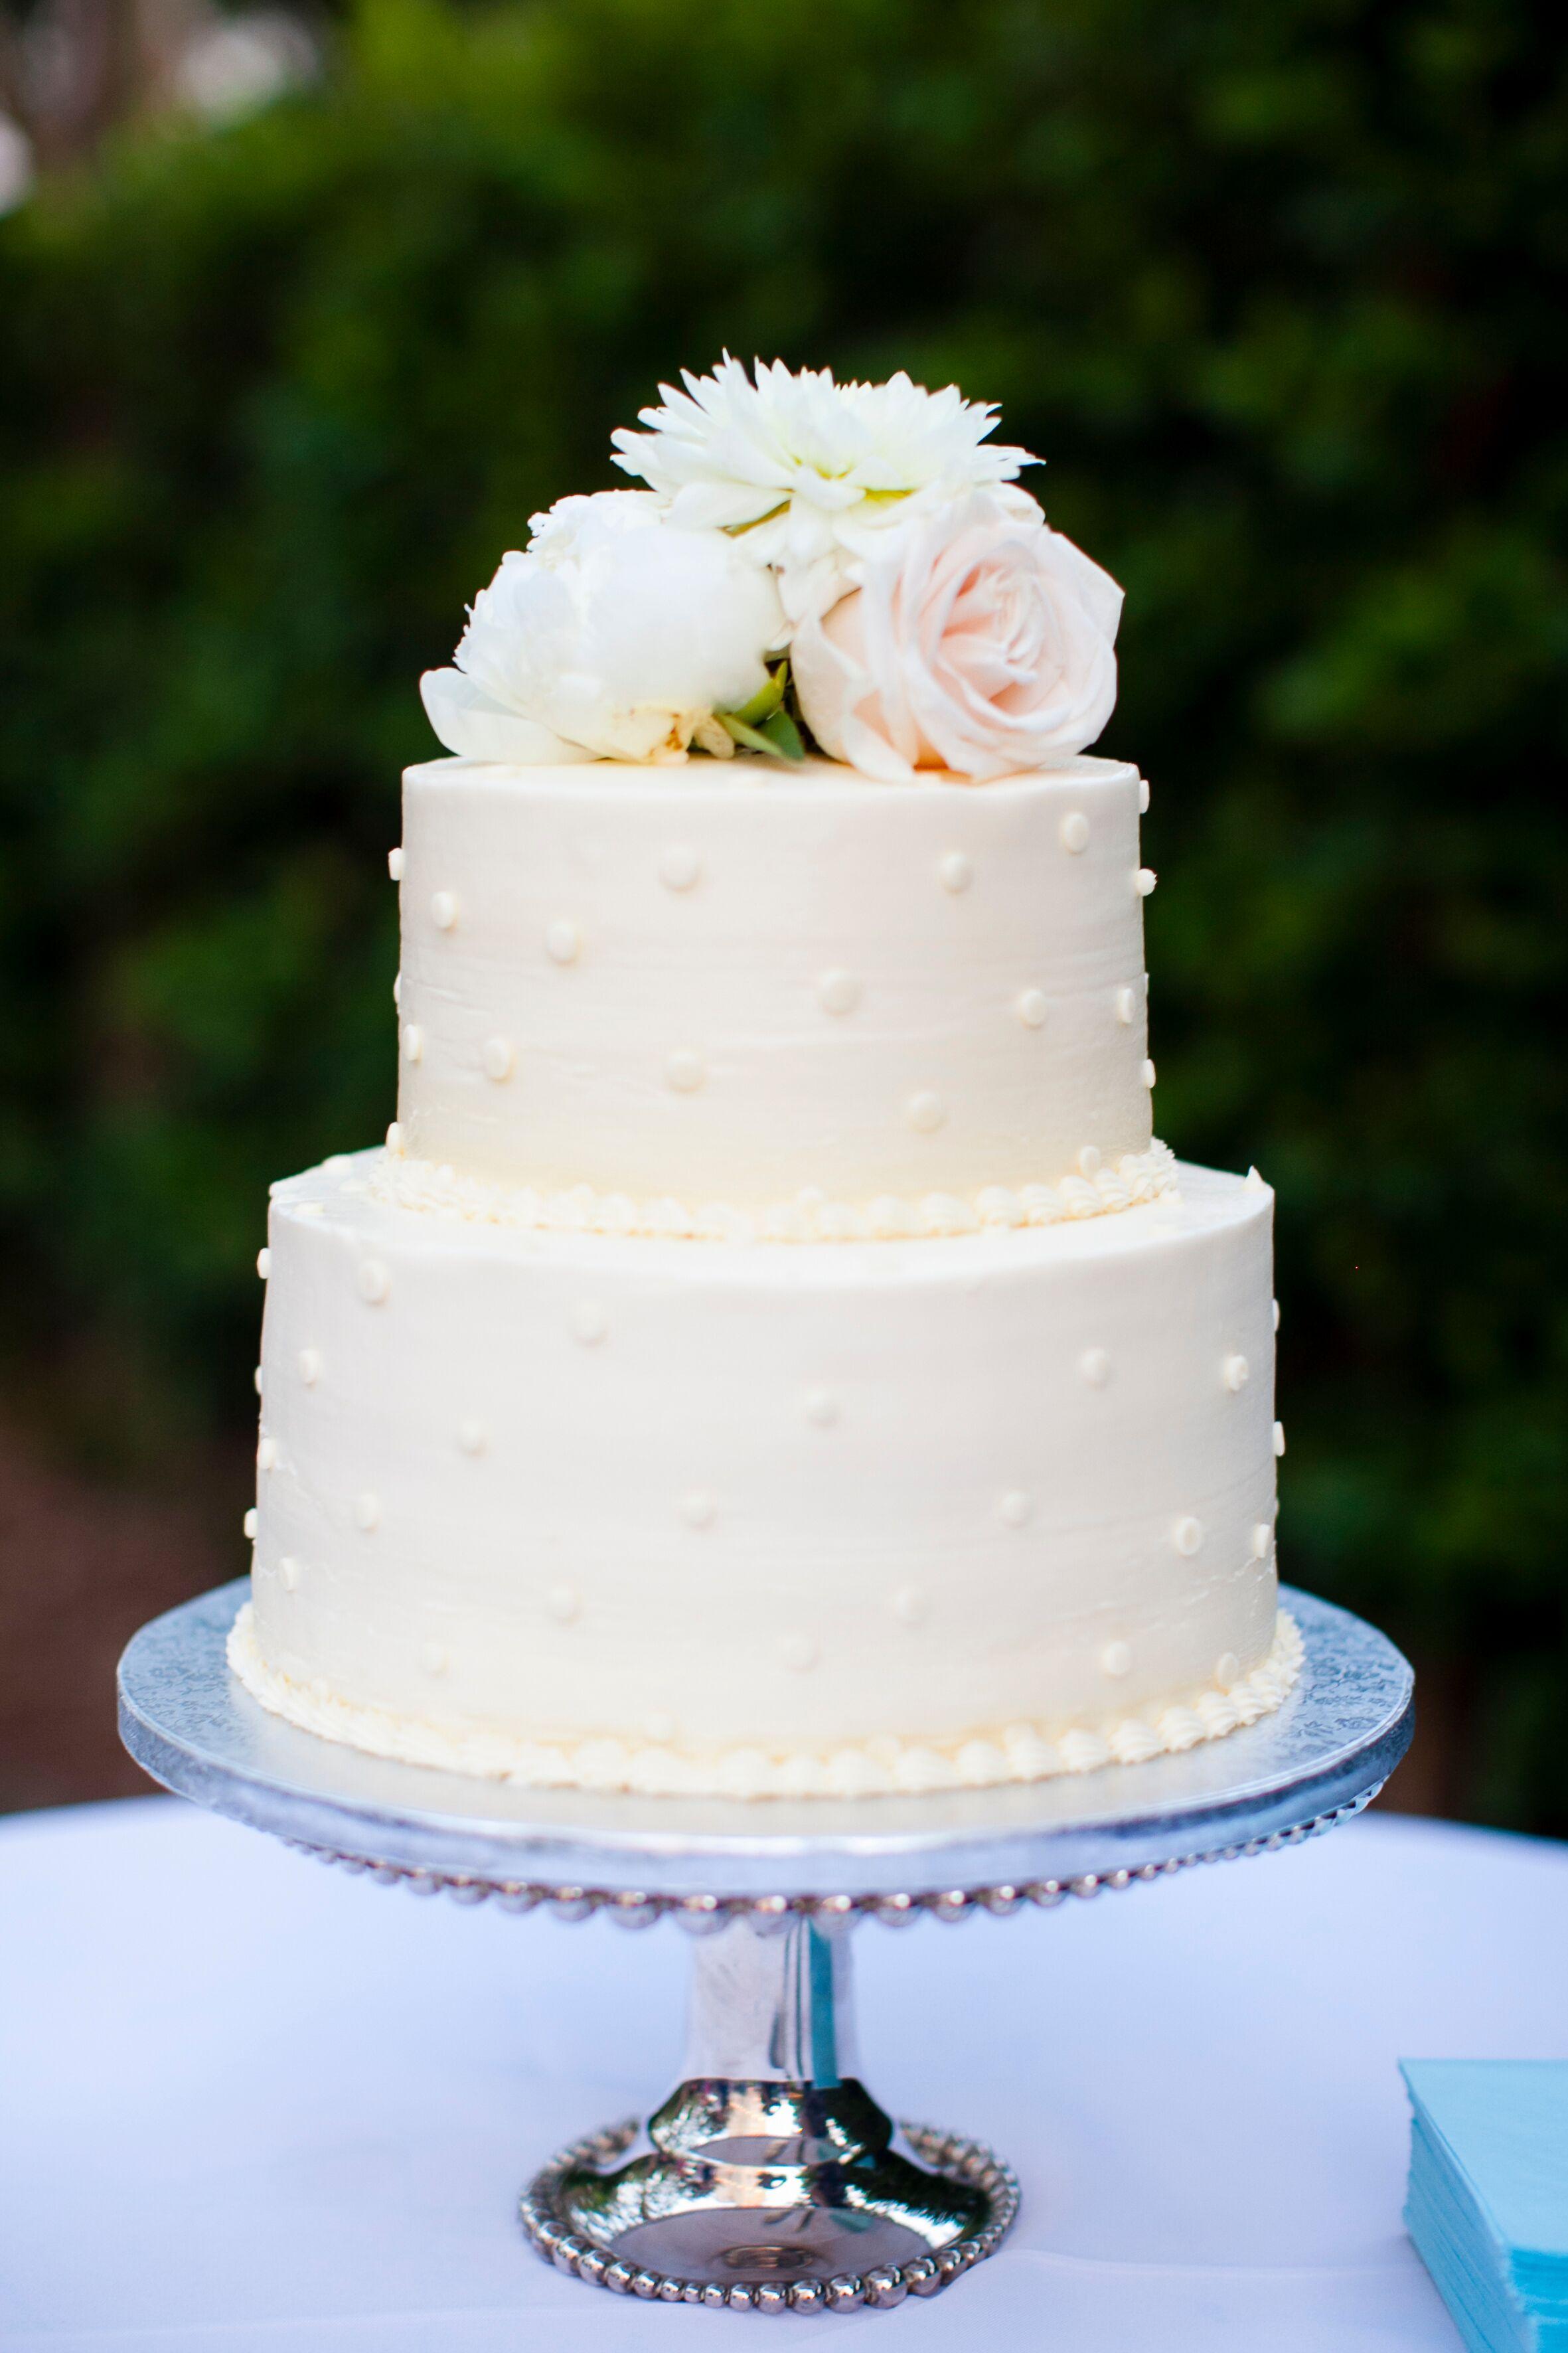 Two-Tier Polka Dot Buttercream Wedding Cake